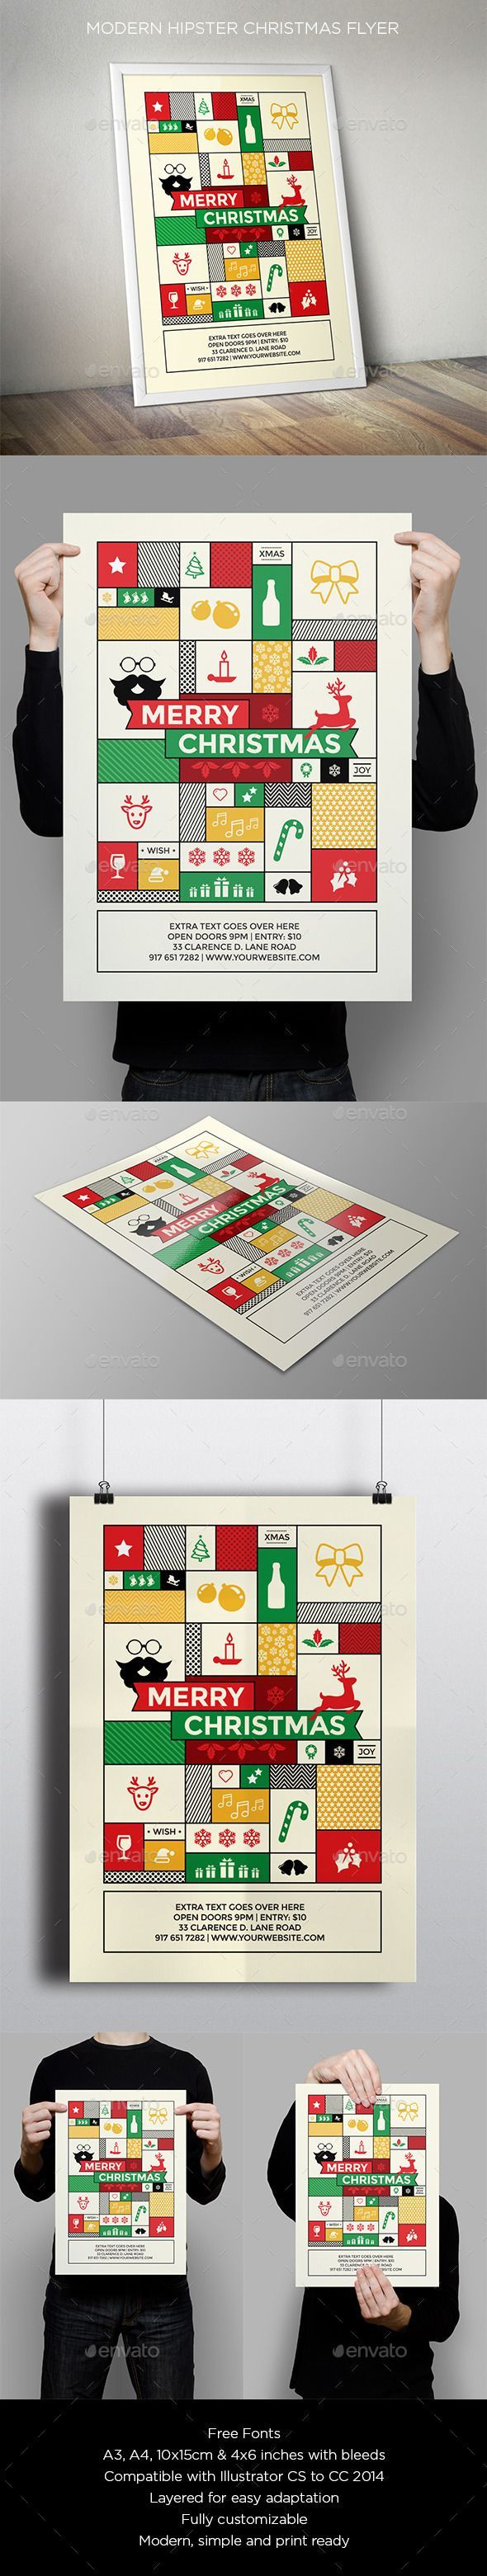 Modern Hipster Christmas Flyer — Vector EPS #christmas card #christmas • Available here → https://graphicriver.net/item/modern-hipster-christmas-flyer/9558528?ref=pxcr